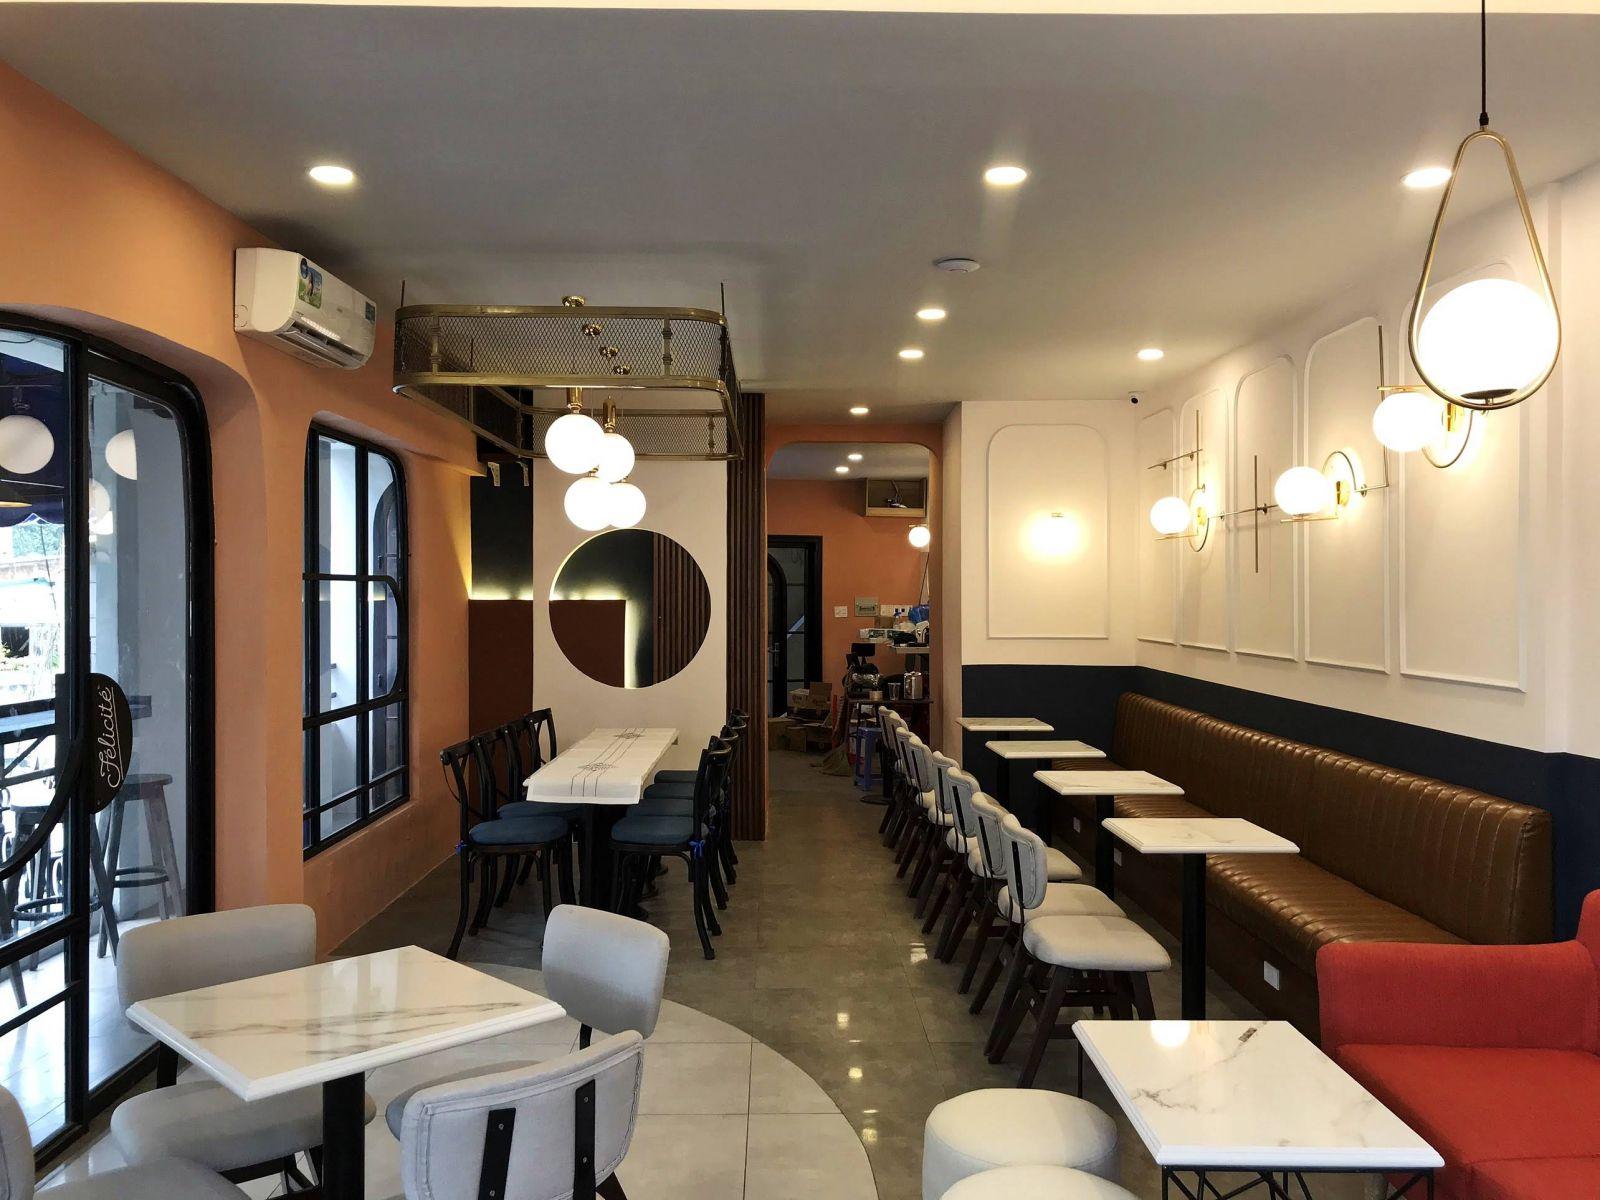 noi-that-Felicite-Coffee&Eatery-42-Tran-Cao-Van-Q3-5